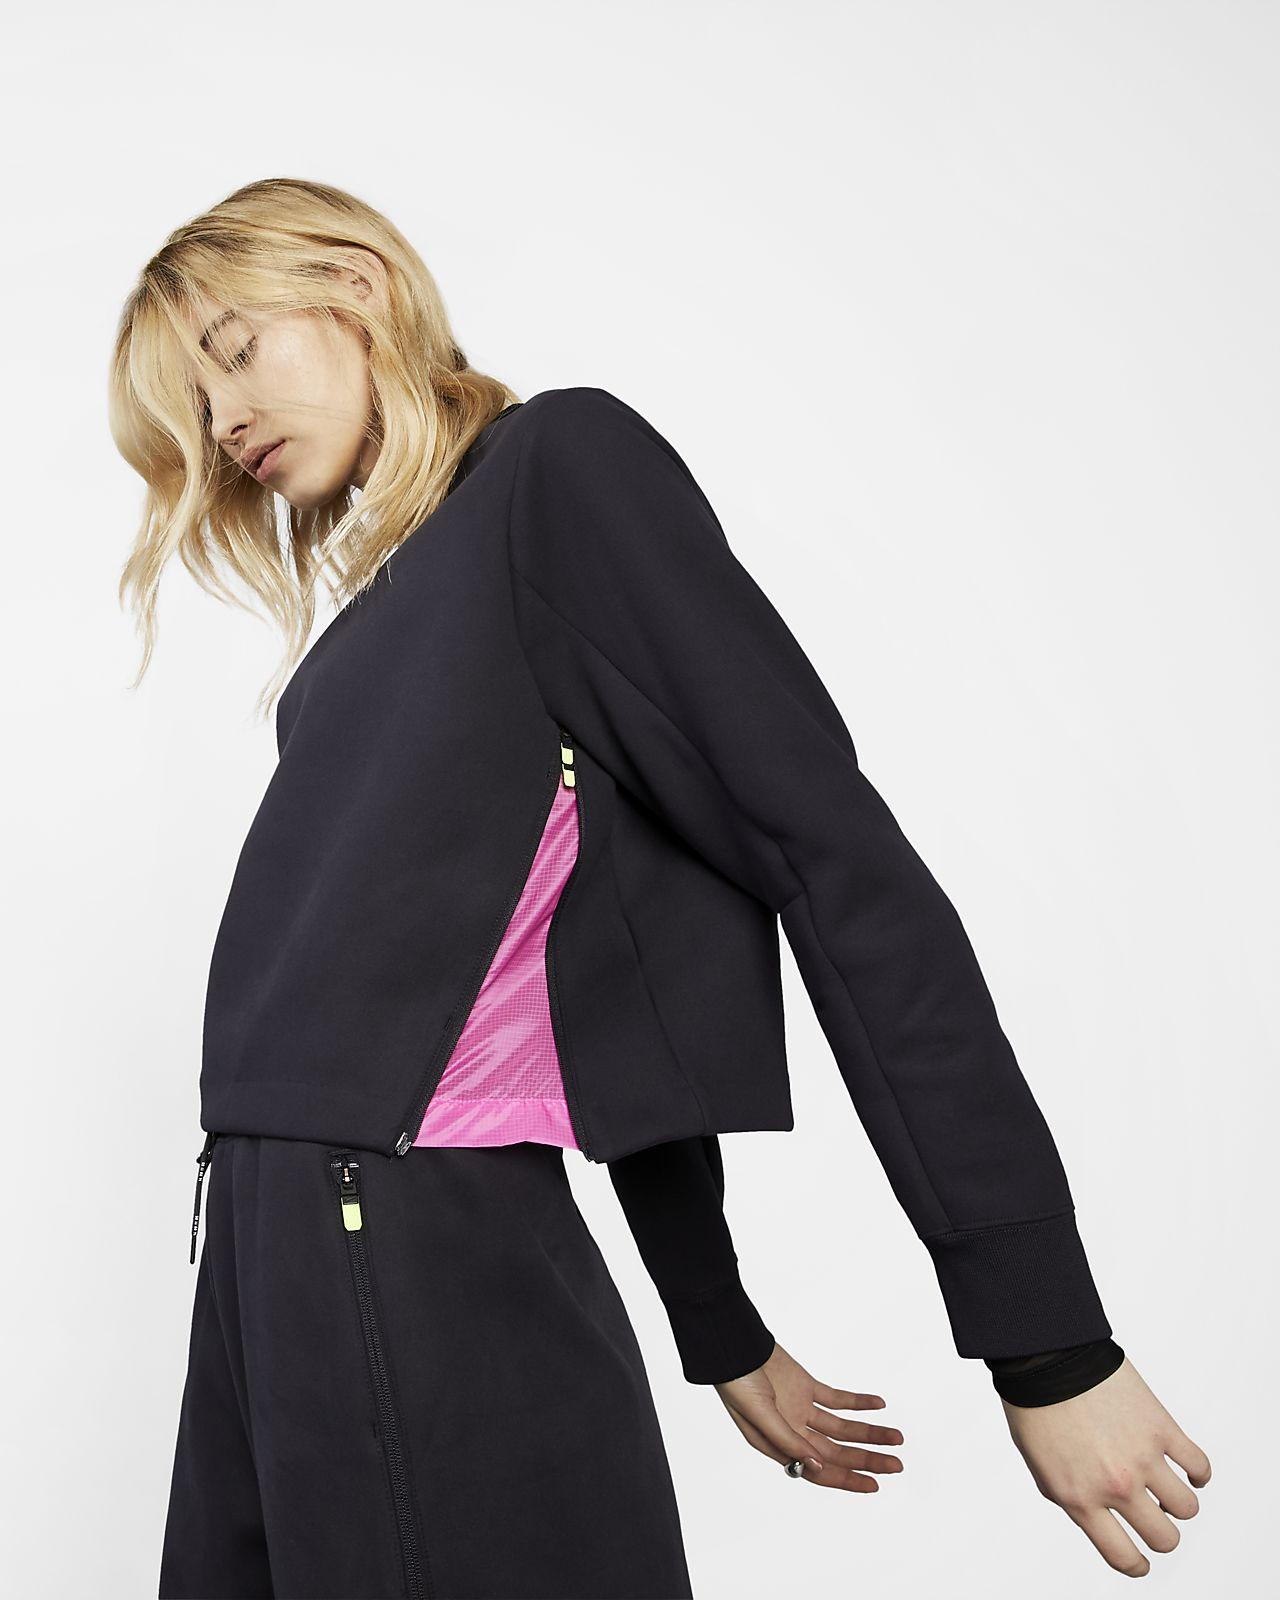 Camisola Nike Sportswear Tech Pack para mulher